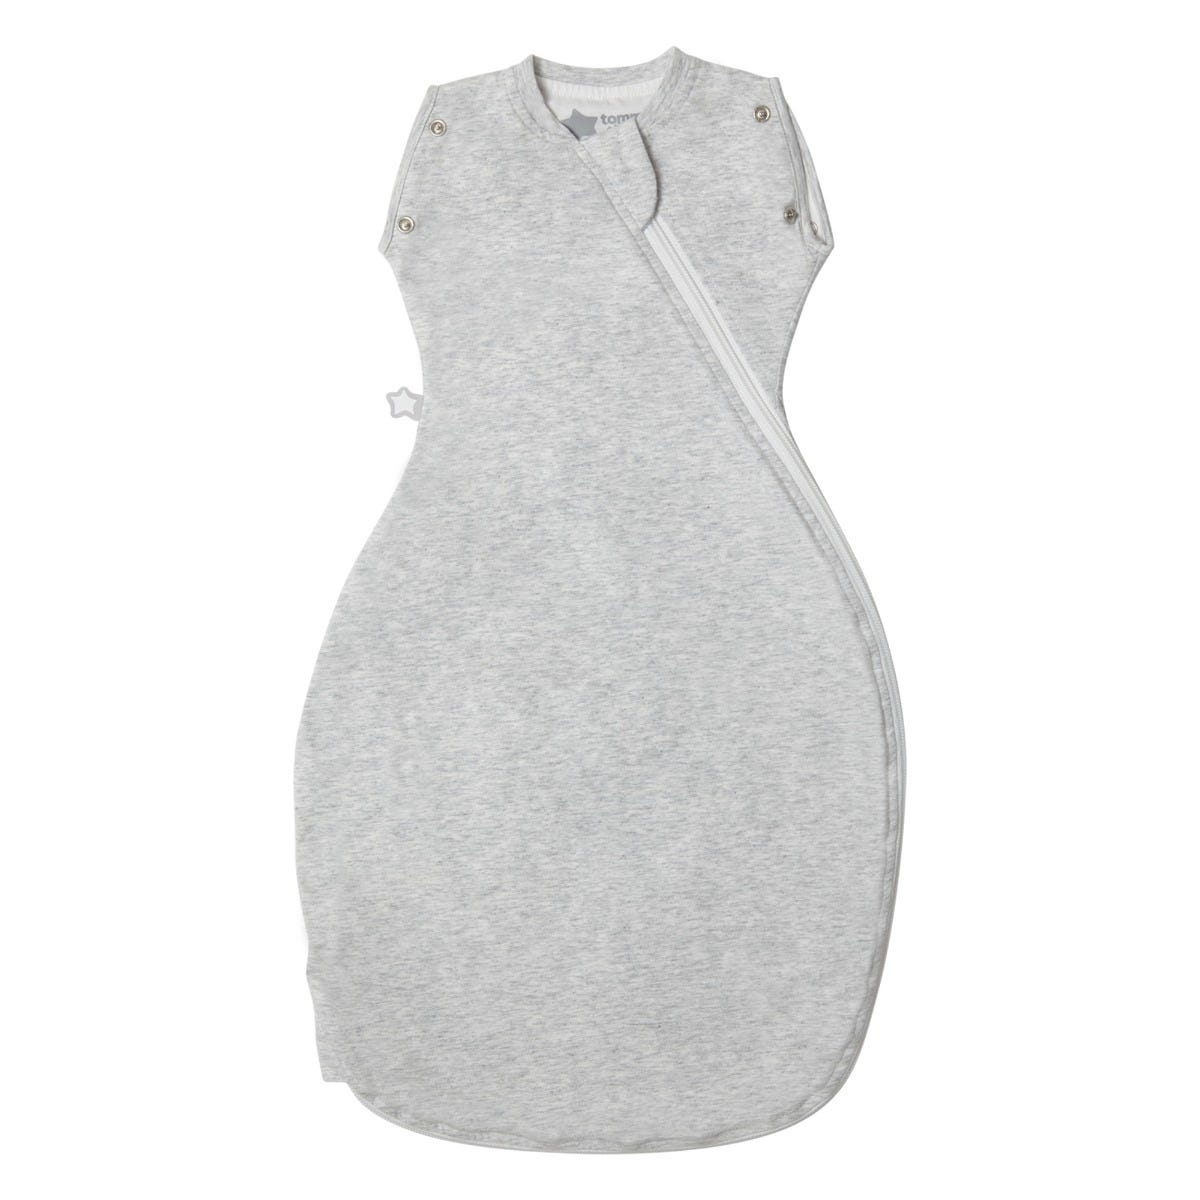 The Original Grobag Grey Marl Snuggle